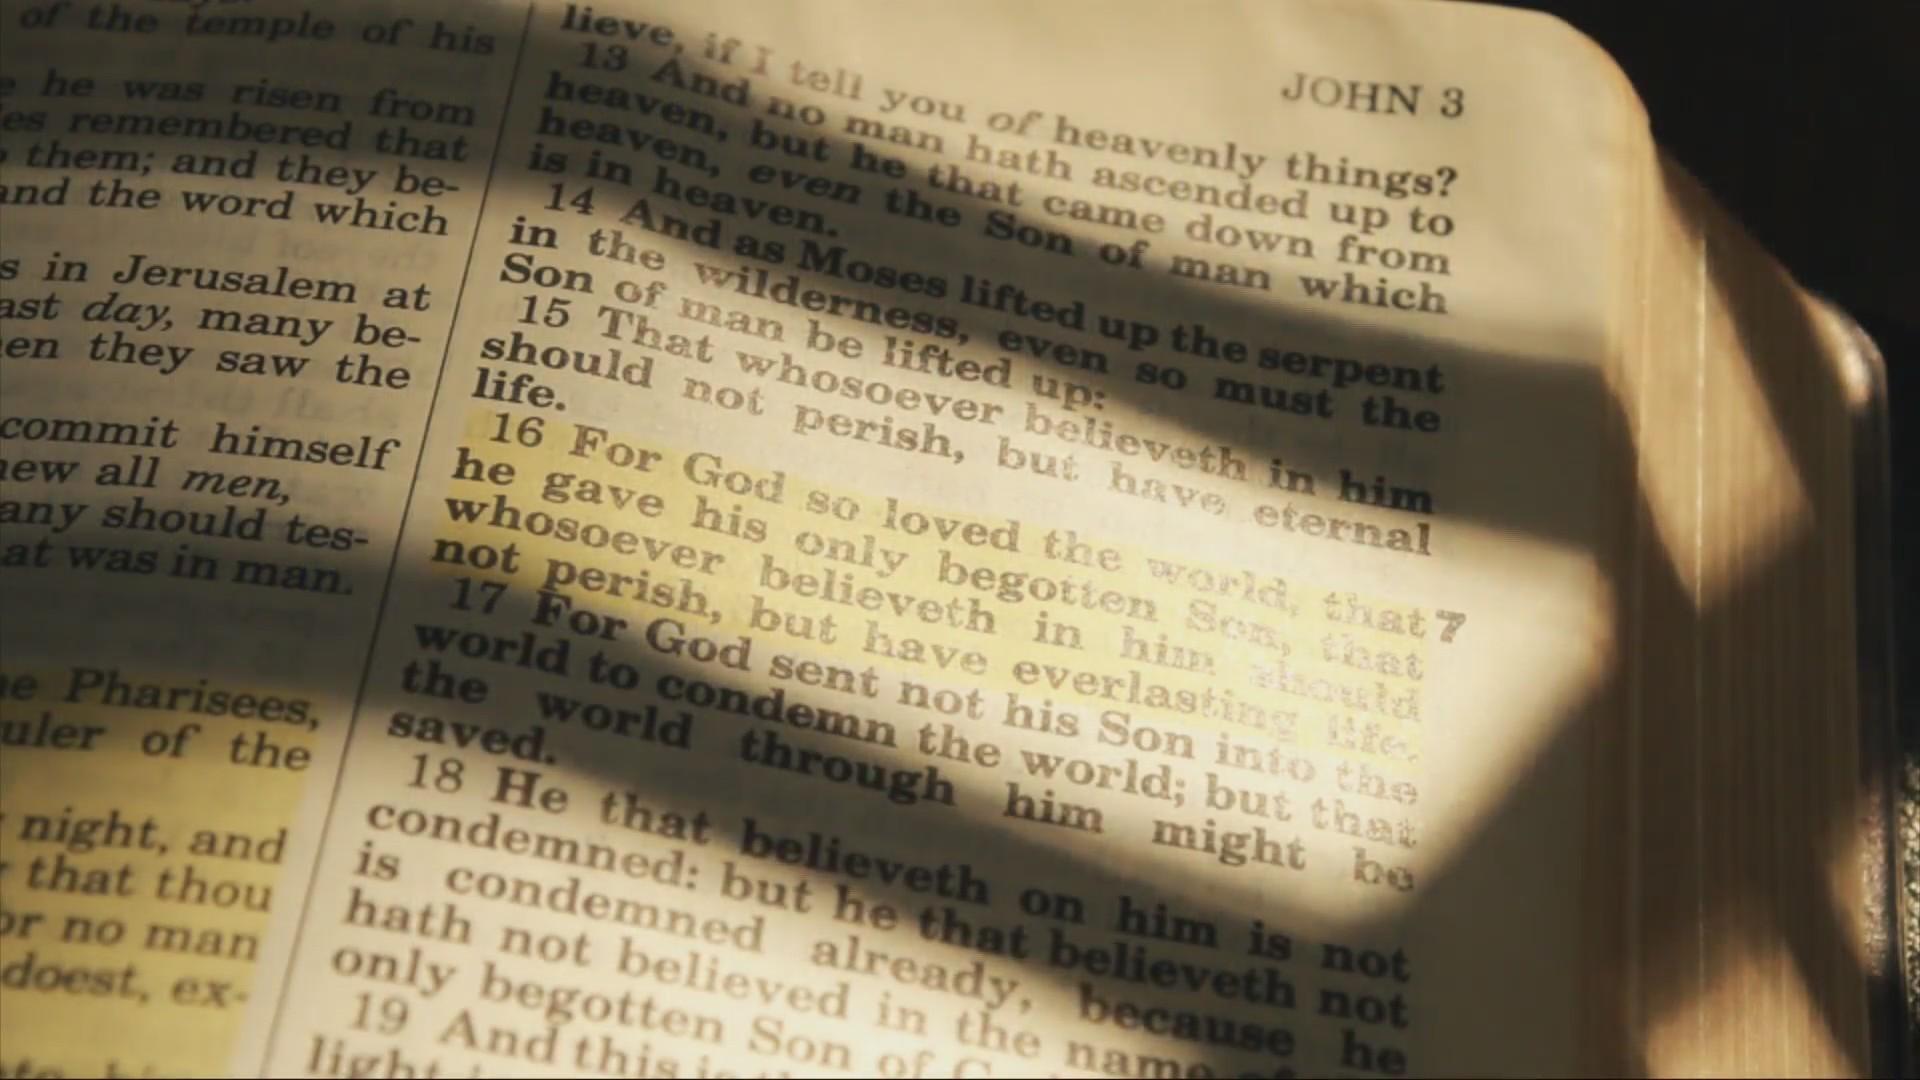 Veteran PTSD: The Faith Option